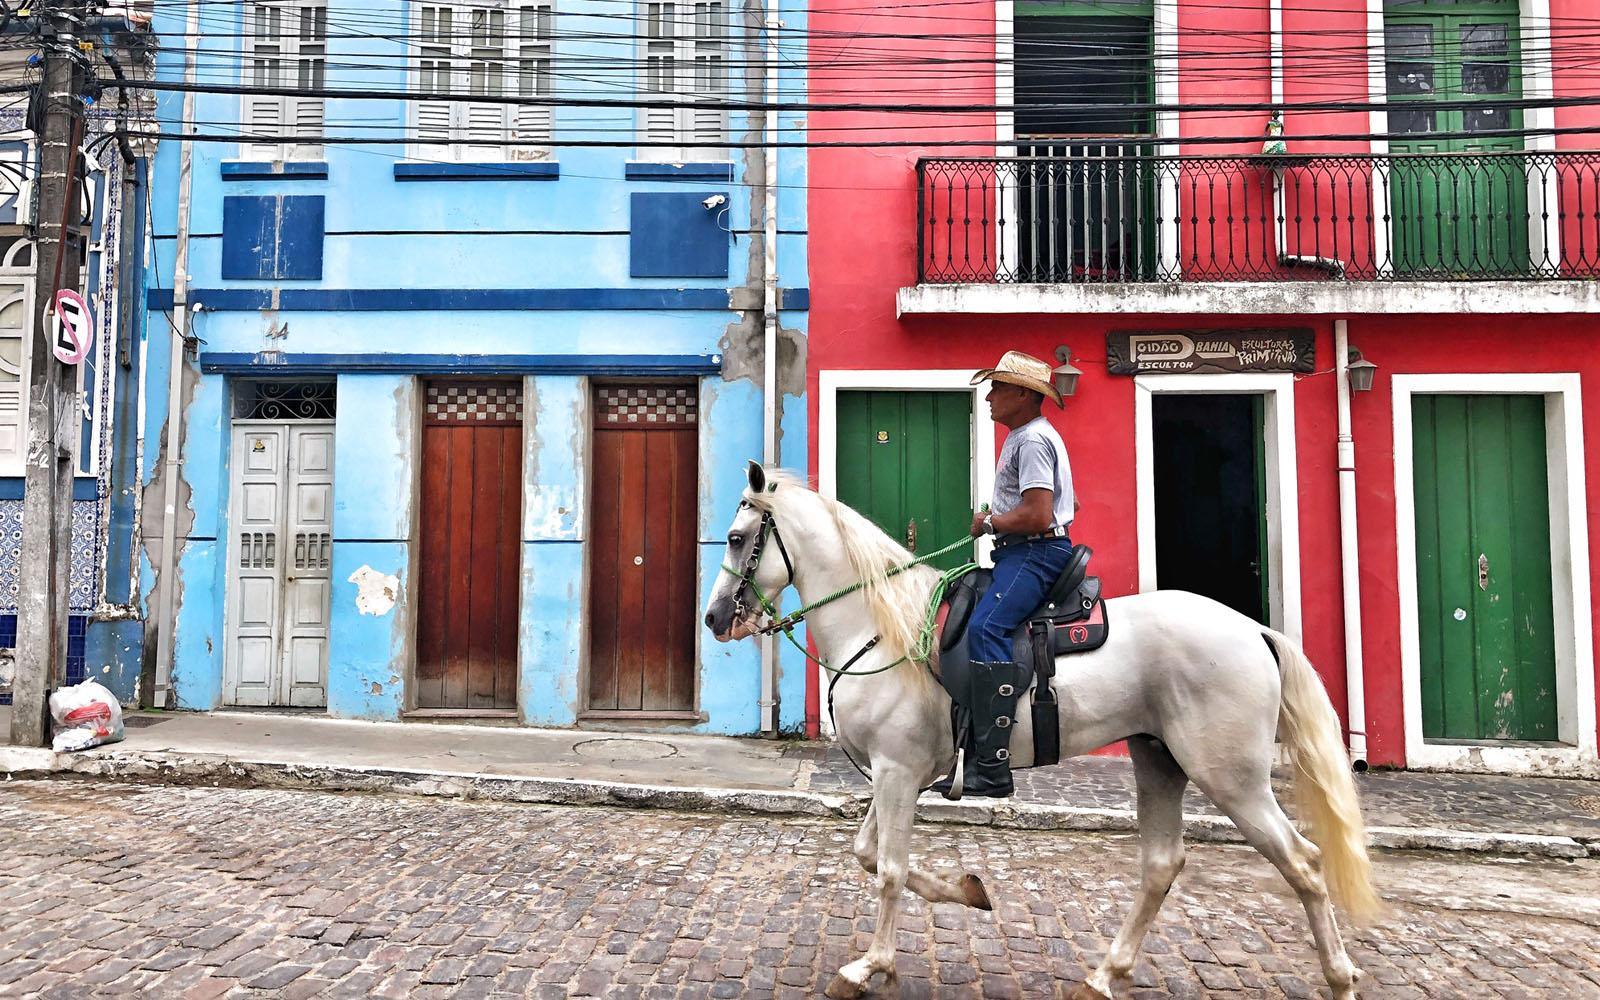 Un uomo a cavallo, tra le strade di Cachoeira. © oltreilbalcone